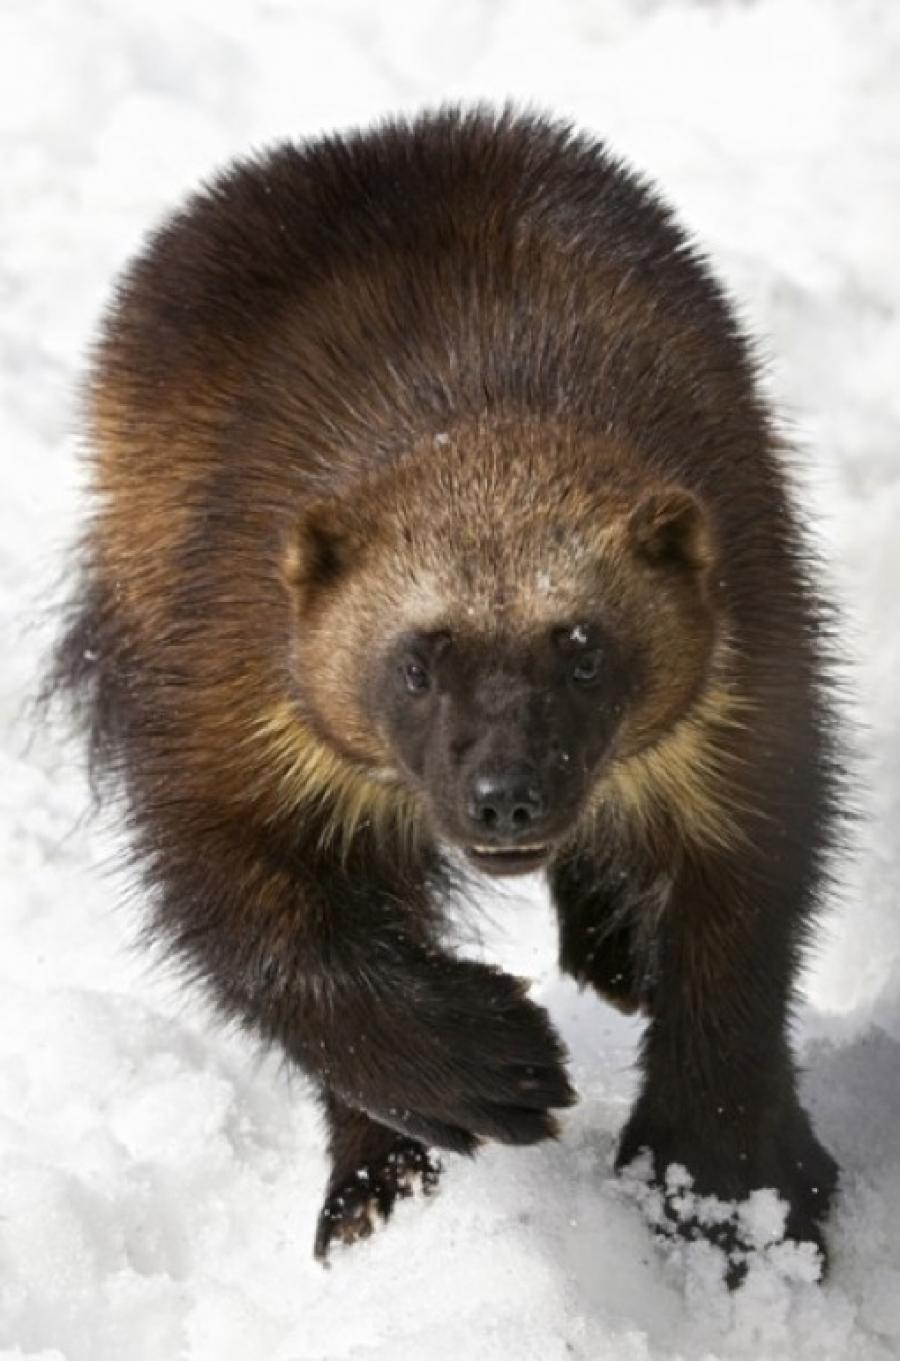 Wolverine. Photo: US Fish and Wildlife Service.